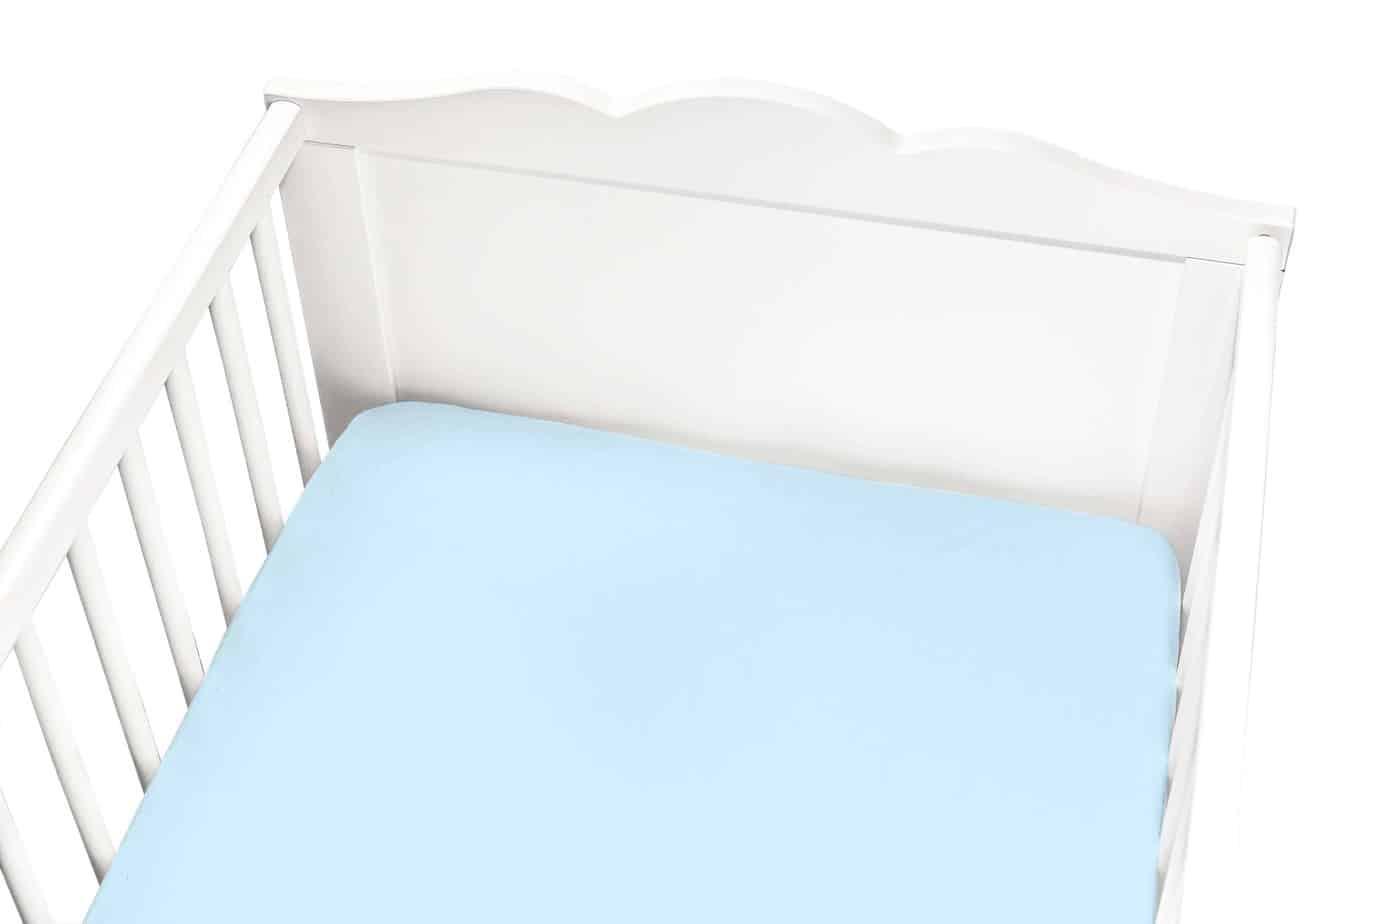 Momeasy Müslin Çarşaf (Mavi)